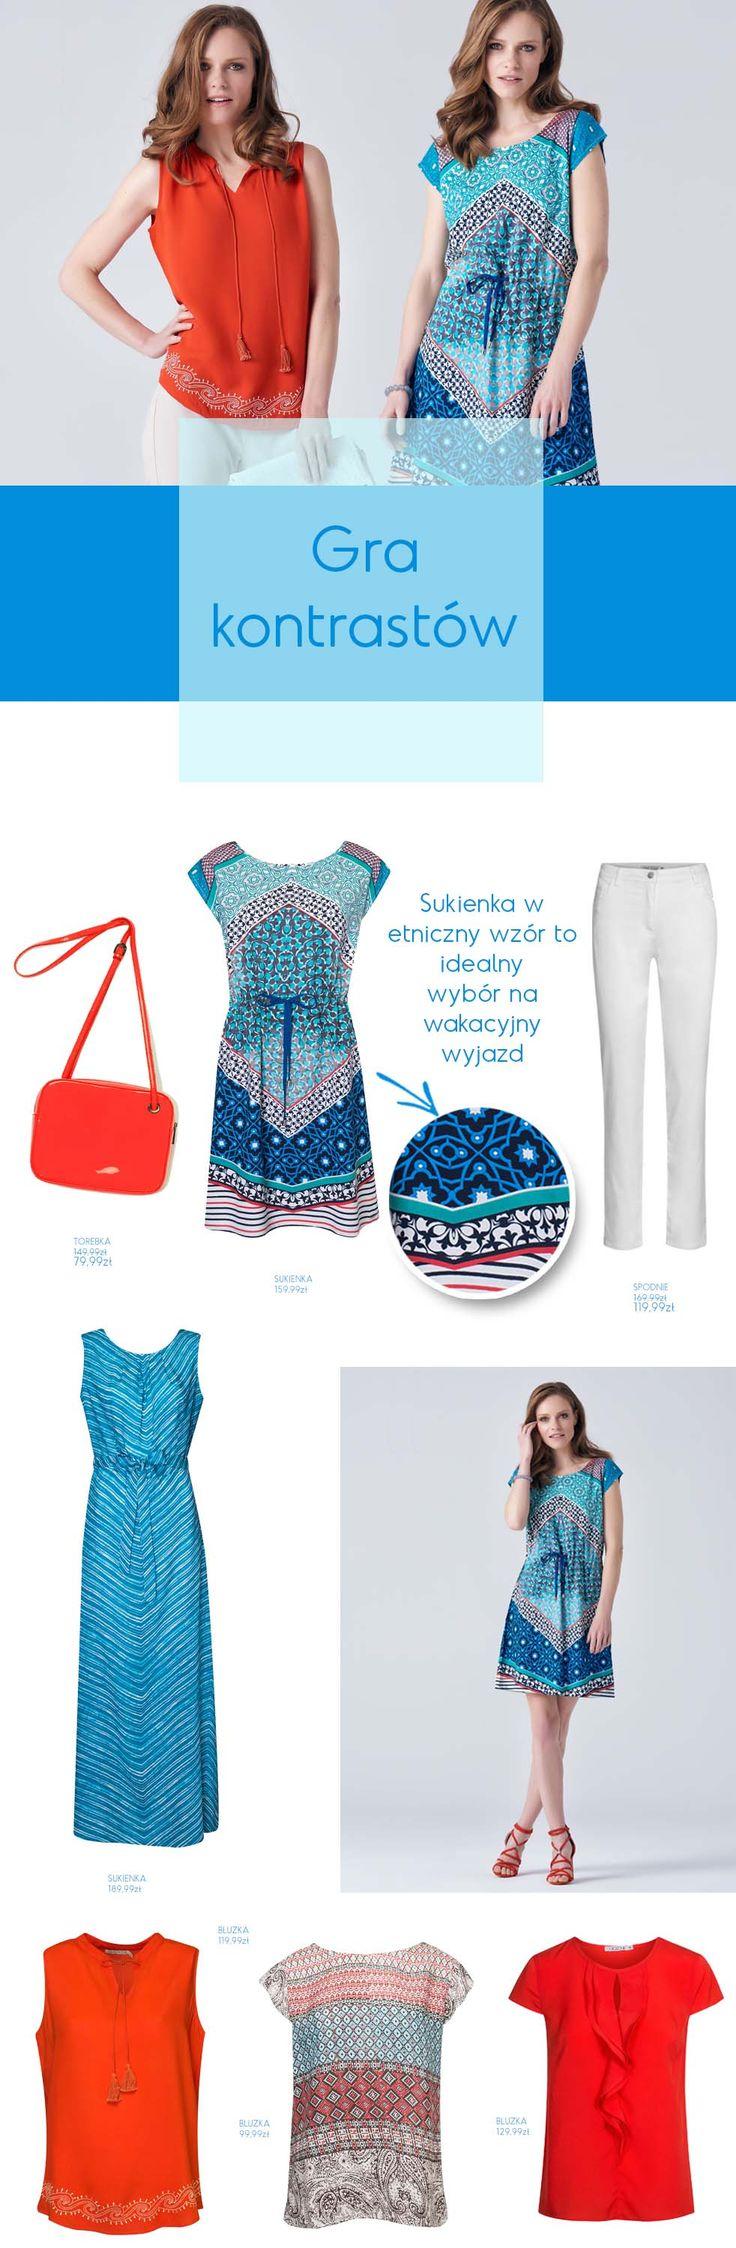 #quiosquepl #quiosque #summer #woman #lady #style #outfit #ootd #feminine #kobieco #womanwear #trends #inspirations #fashion #polishfashion #polishbrand